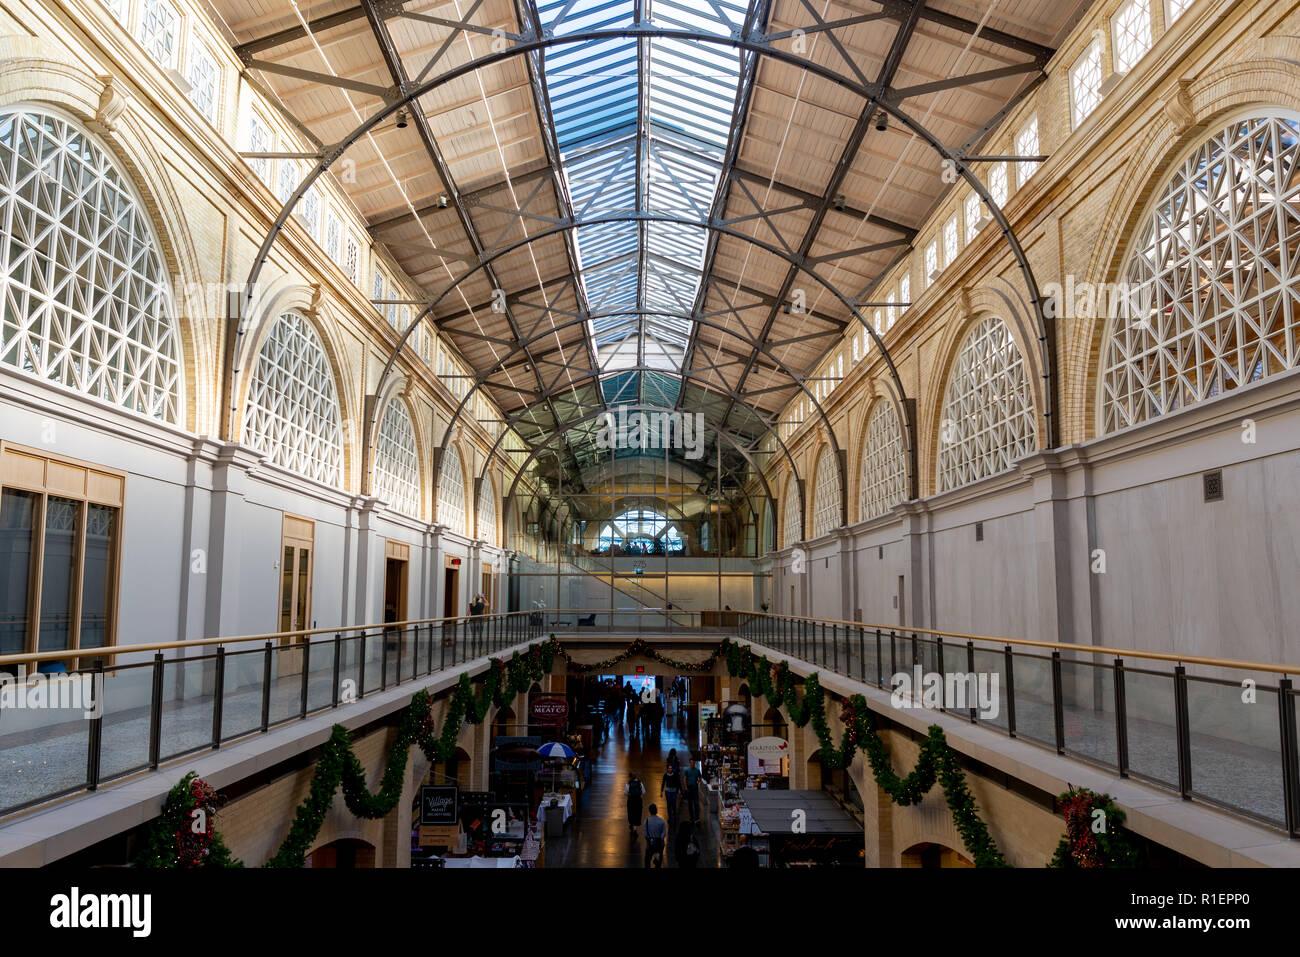 SAN FRANCISCO - NOVEMBER 07 2018: Inside of Beaux Arts style Ferry Building Marketplace Stock Photo